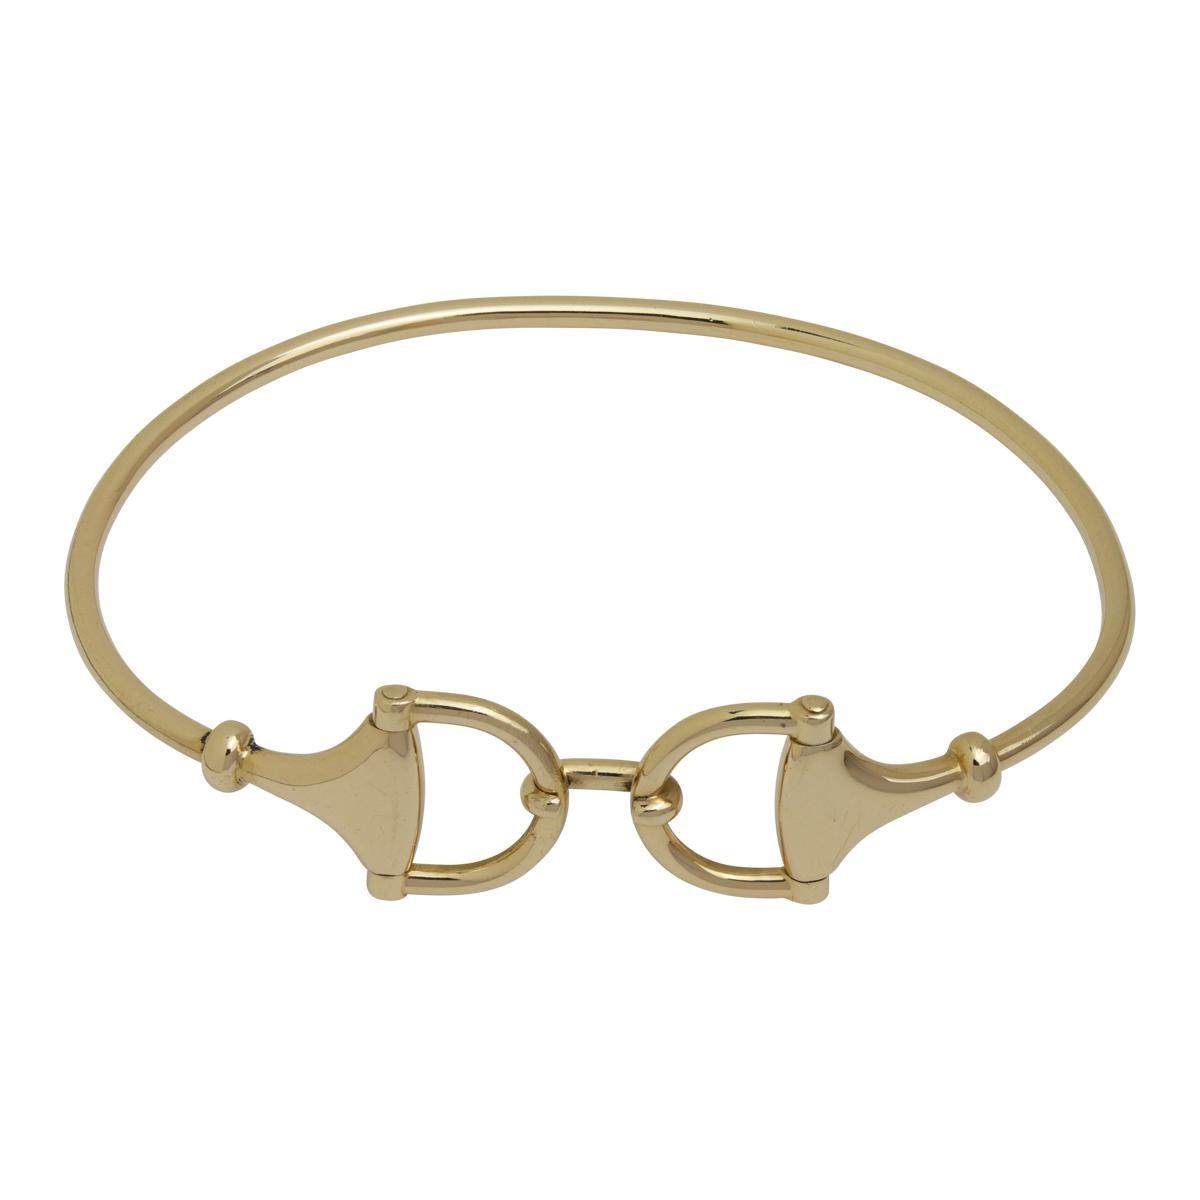 18 Karat Yellow Gold Gucci Horsebit Bangle